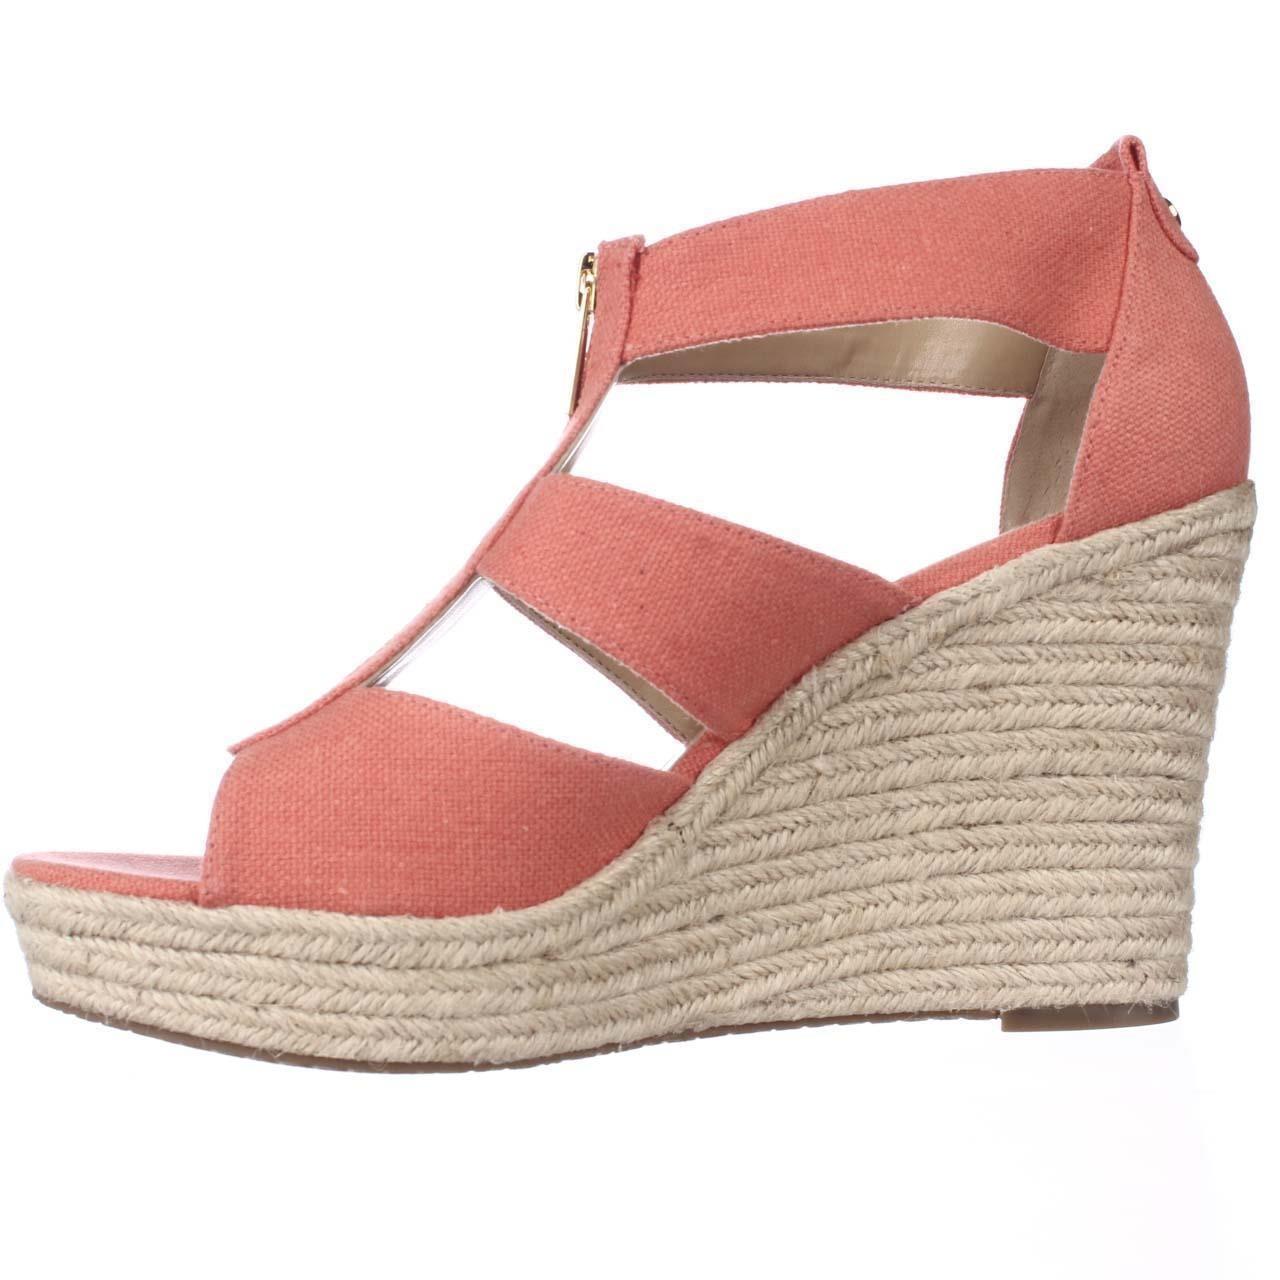 2451e3aed7 Michael Michael Kors Womens Damita Canvas Open Toe Casual Platform Sandals